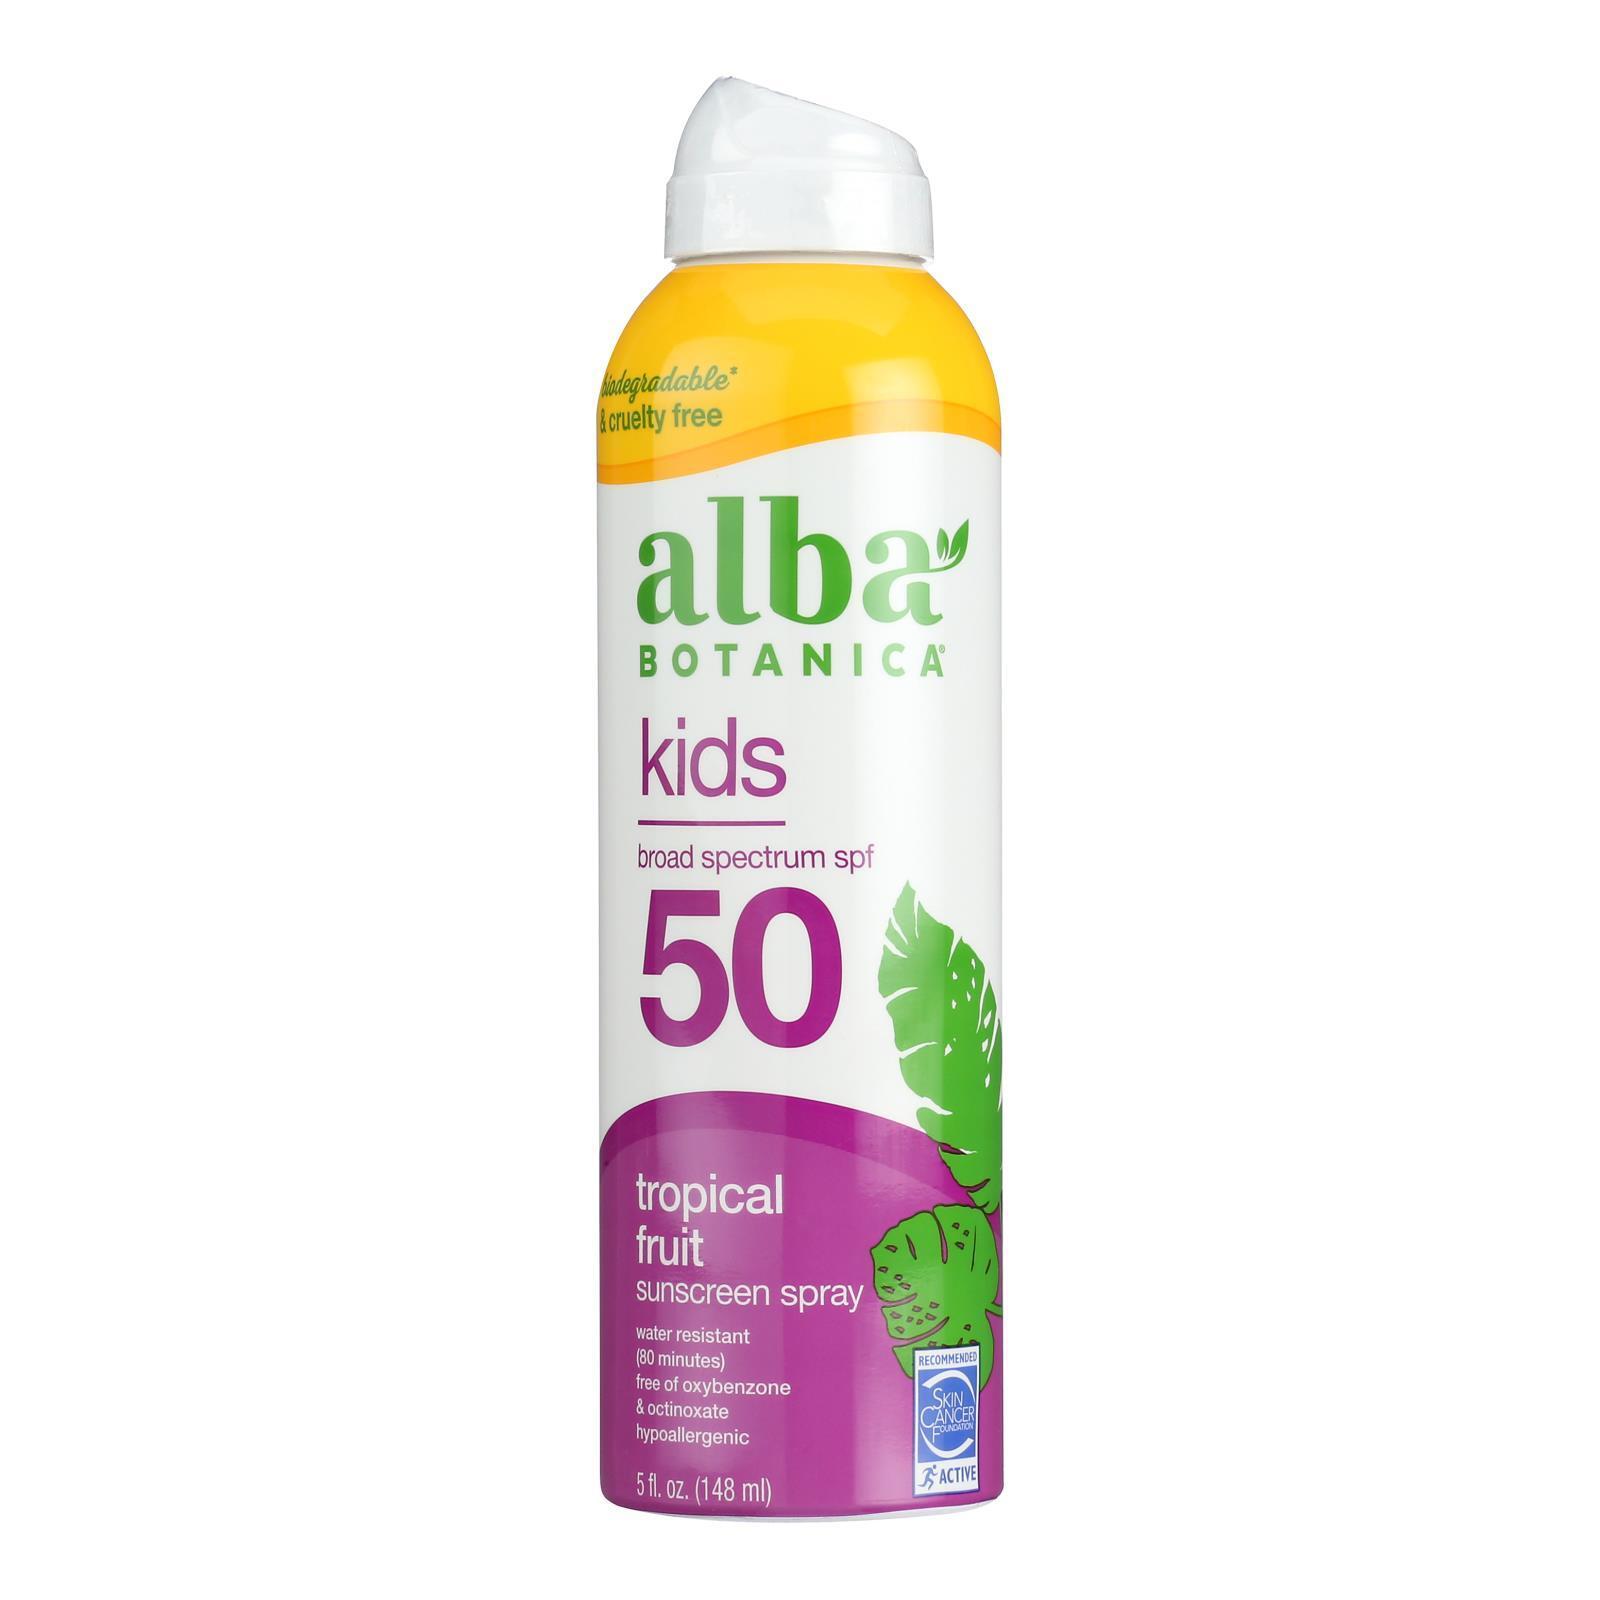 Alba Botanica Sunscreen - Very Emollient - Clear Spray SPF 50 - Active Kids - 6 oz